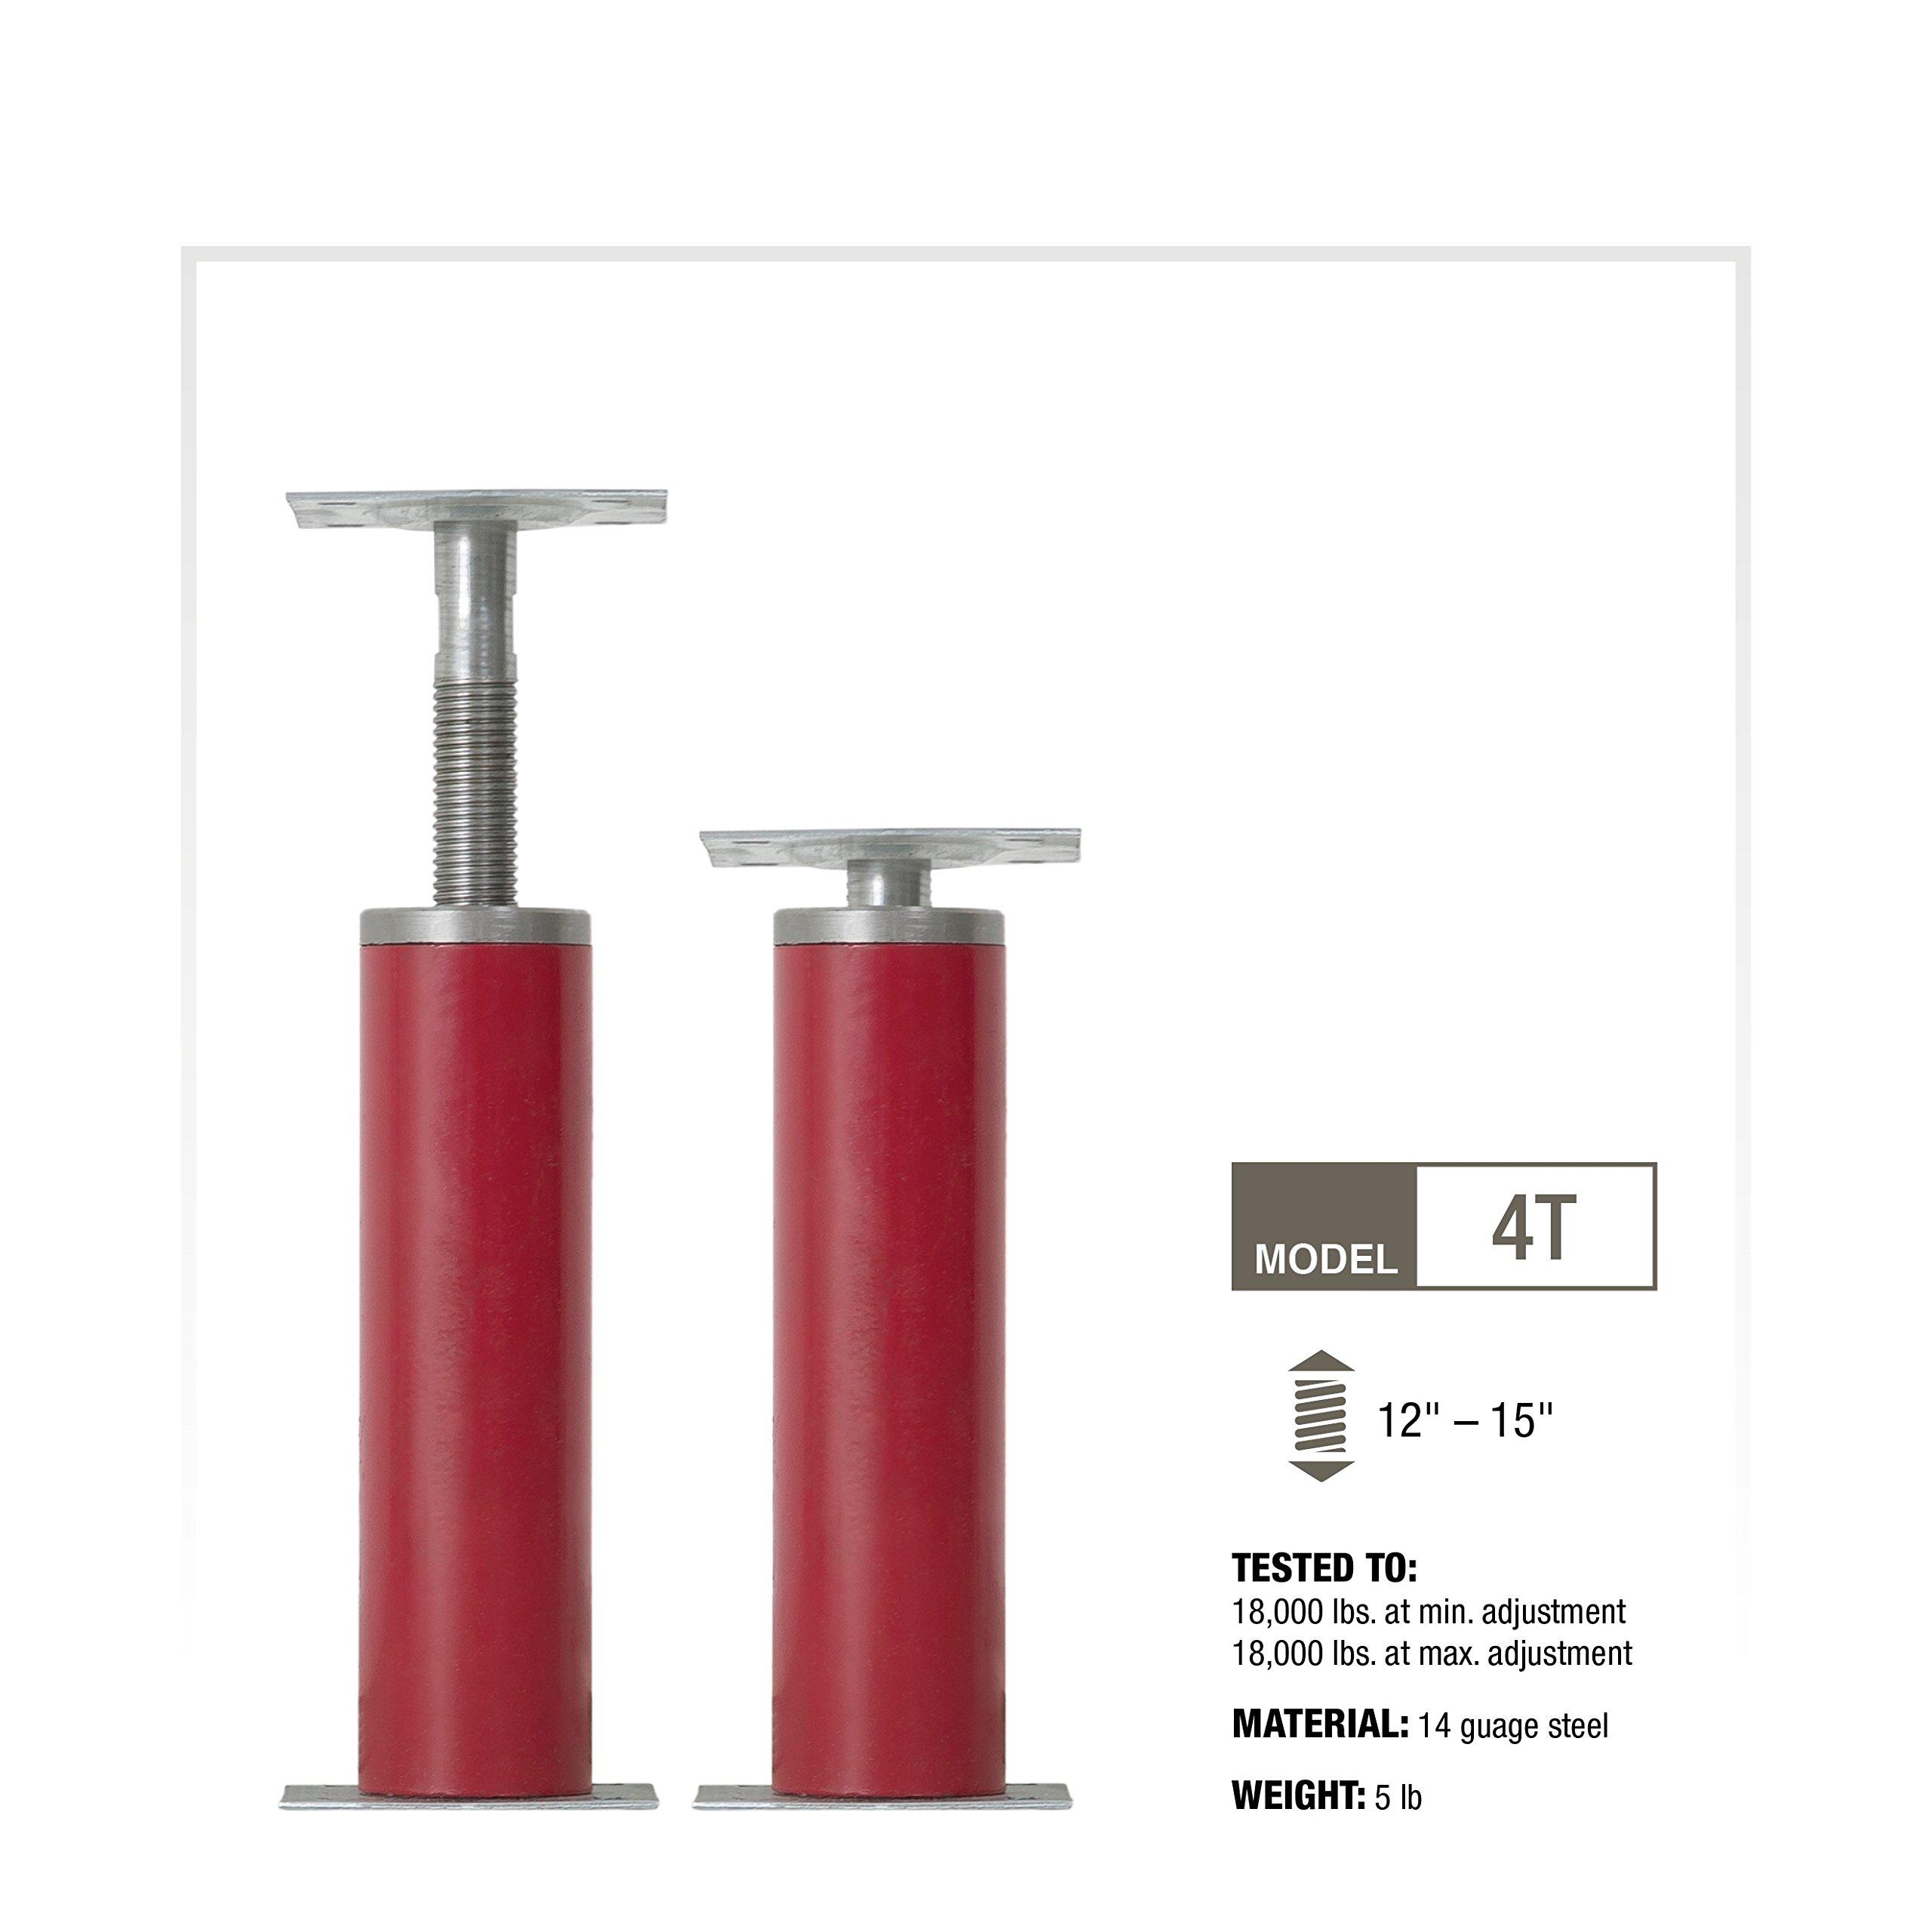 CoreLine Mfg Adjustable Jack Post — 12in.–15in. Adjustable Length, Model# 4T